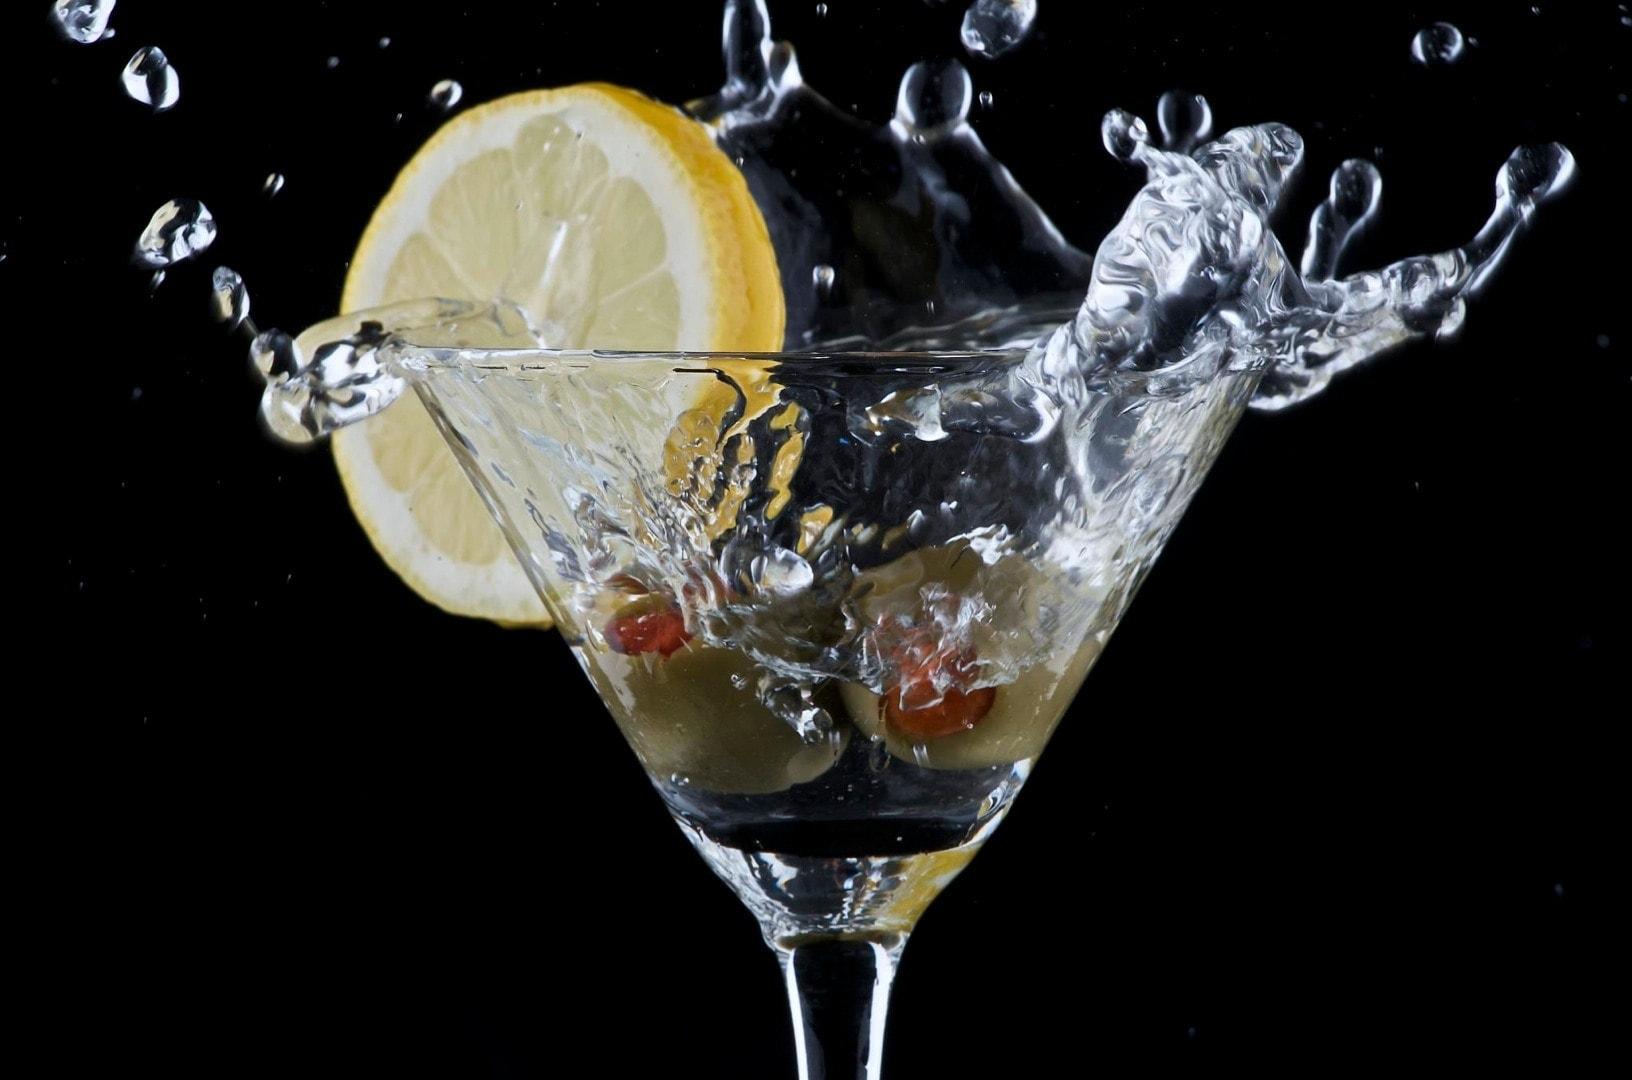 Applications de boissons